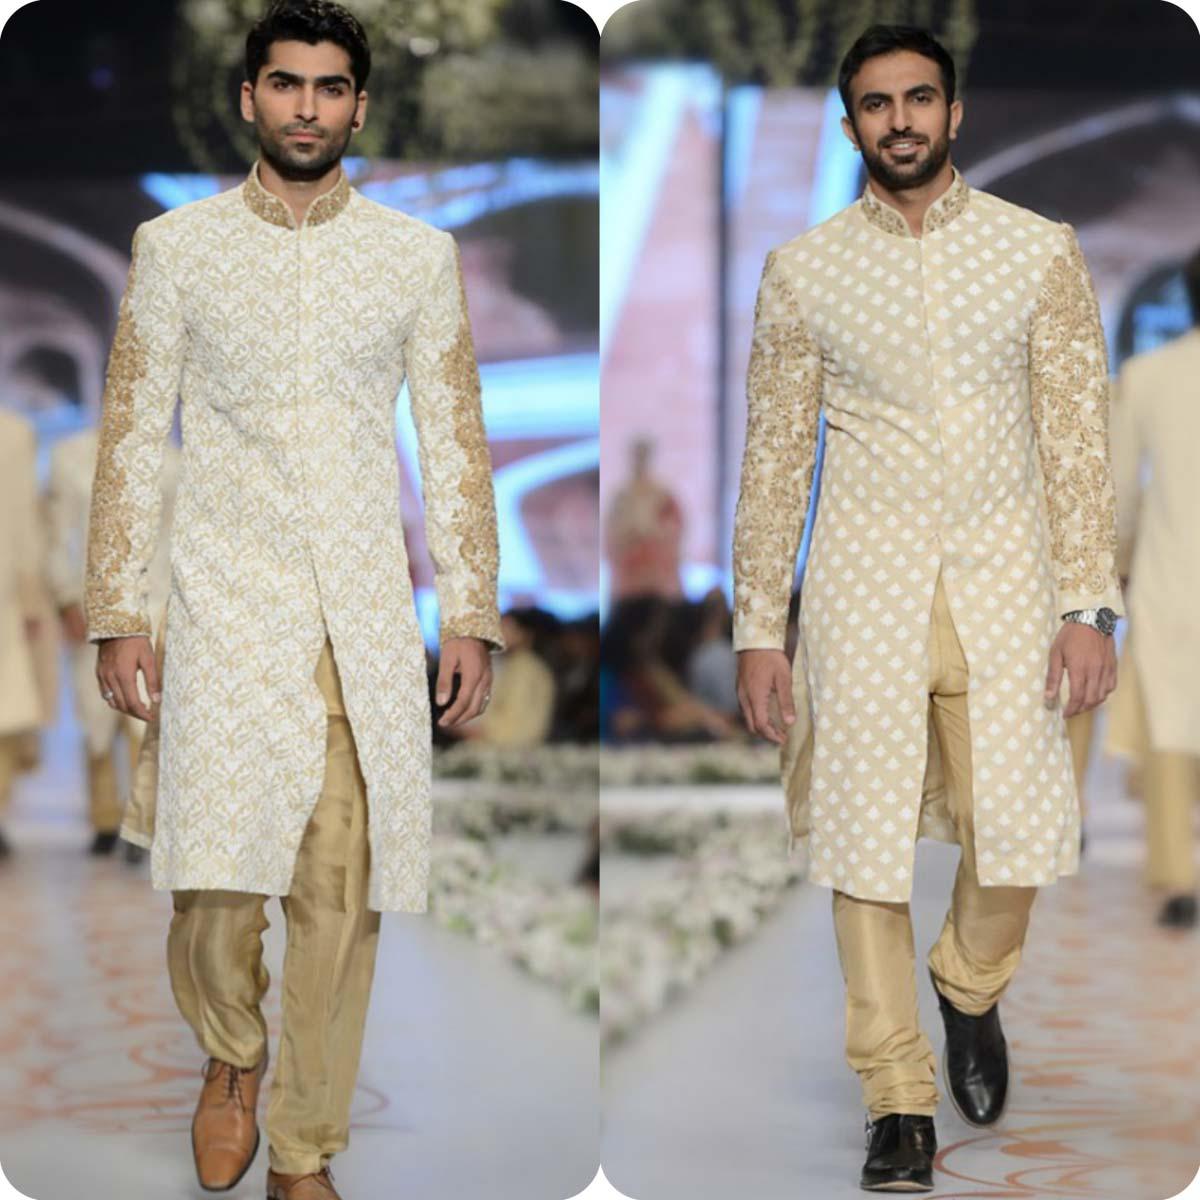 Pin stylish black pathani suit kurta for men ajilbabcom portal picture - Pin Stylish Black Pathani Suit Kurta For Men Ajilbabcom Portal Picture Men Wedding Sherwani Dresses Download